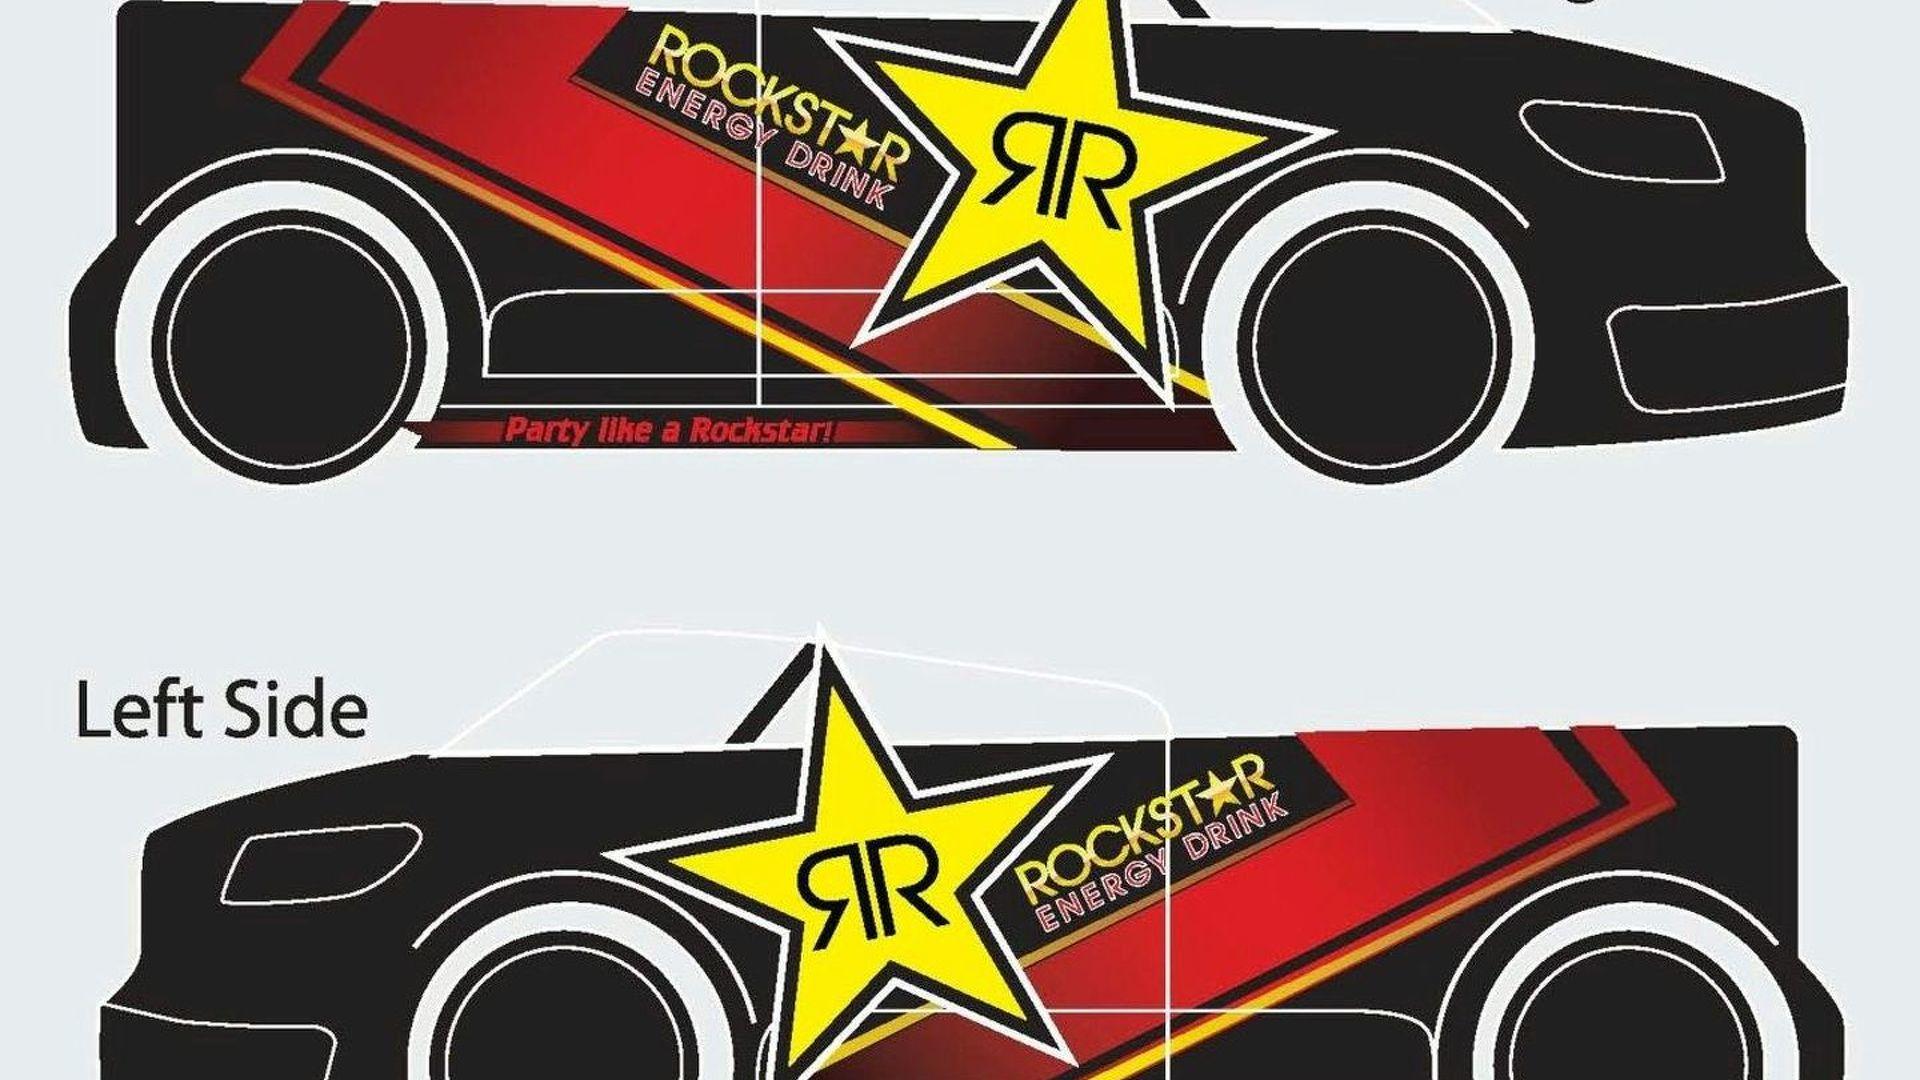 Scion xB by Cartel Rockstar at SEMA